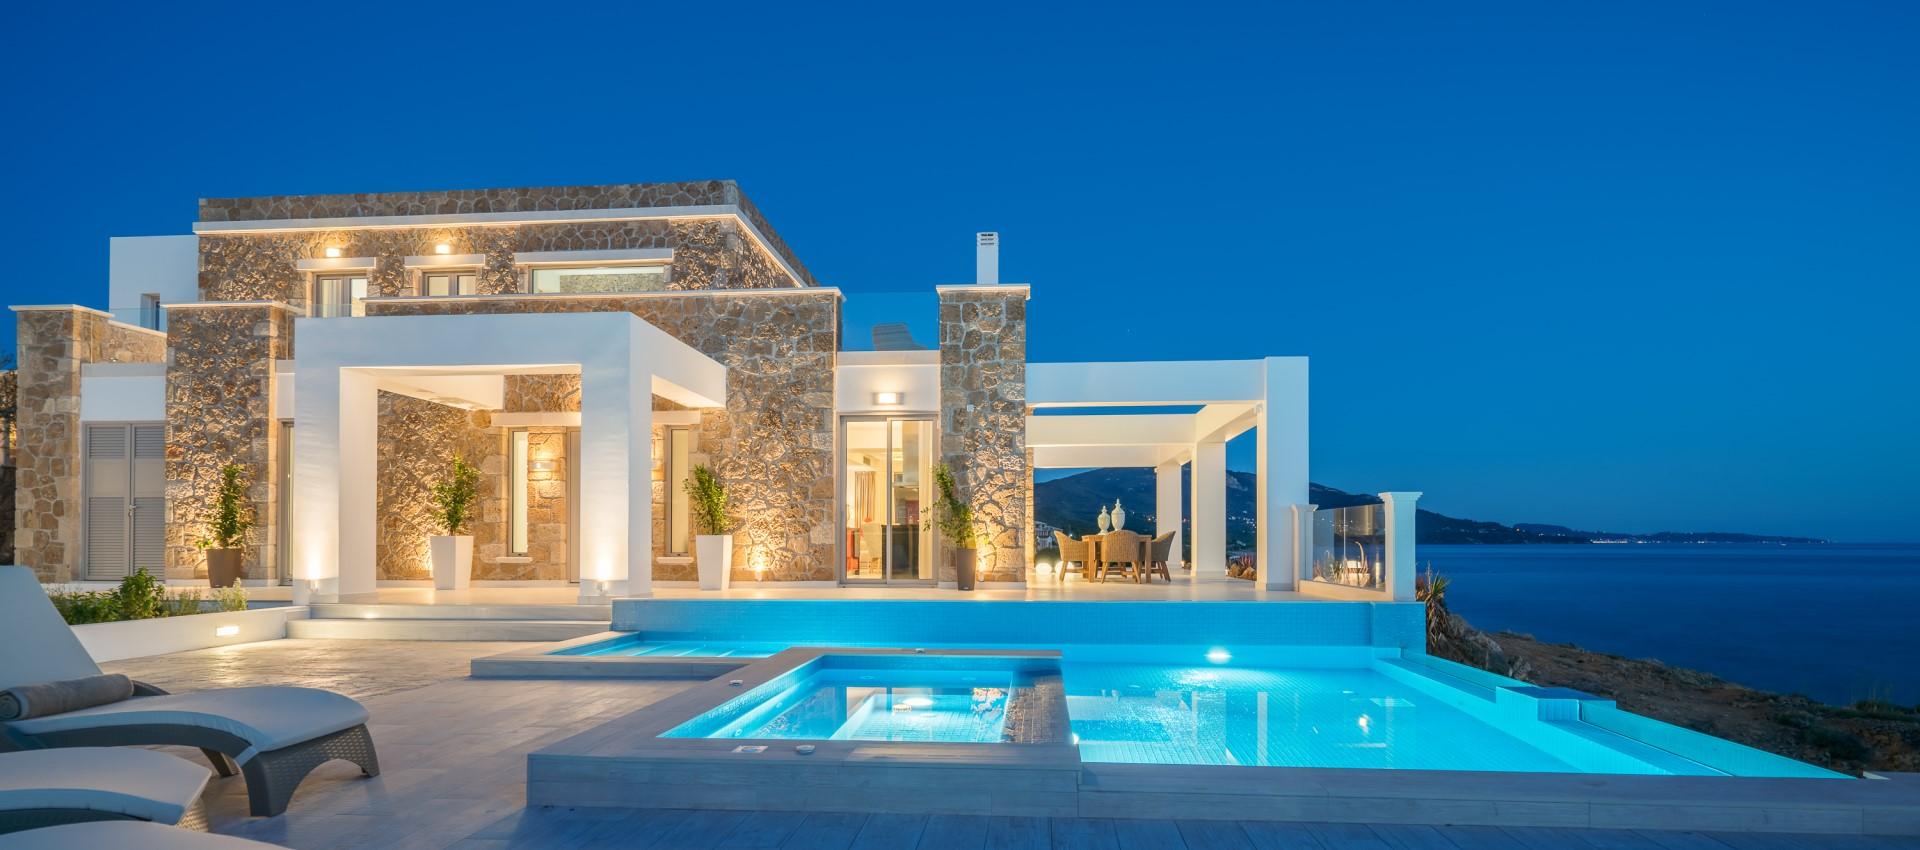 Tambouros Boutique Villas Vassilikos Zakynthos Luxury